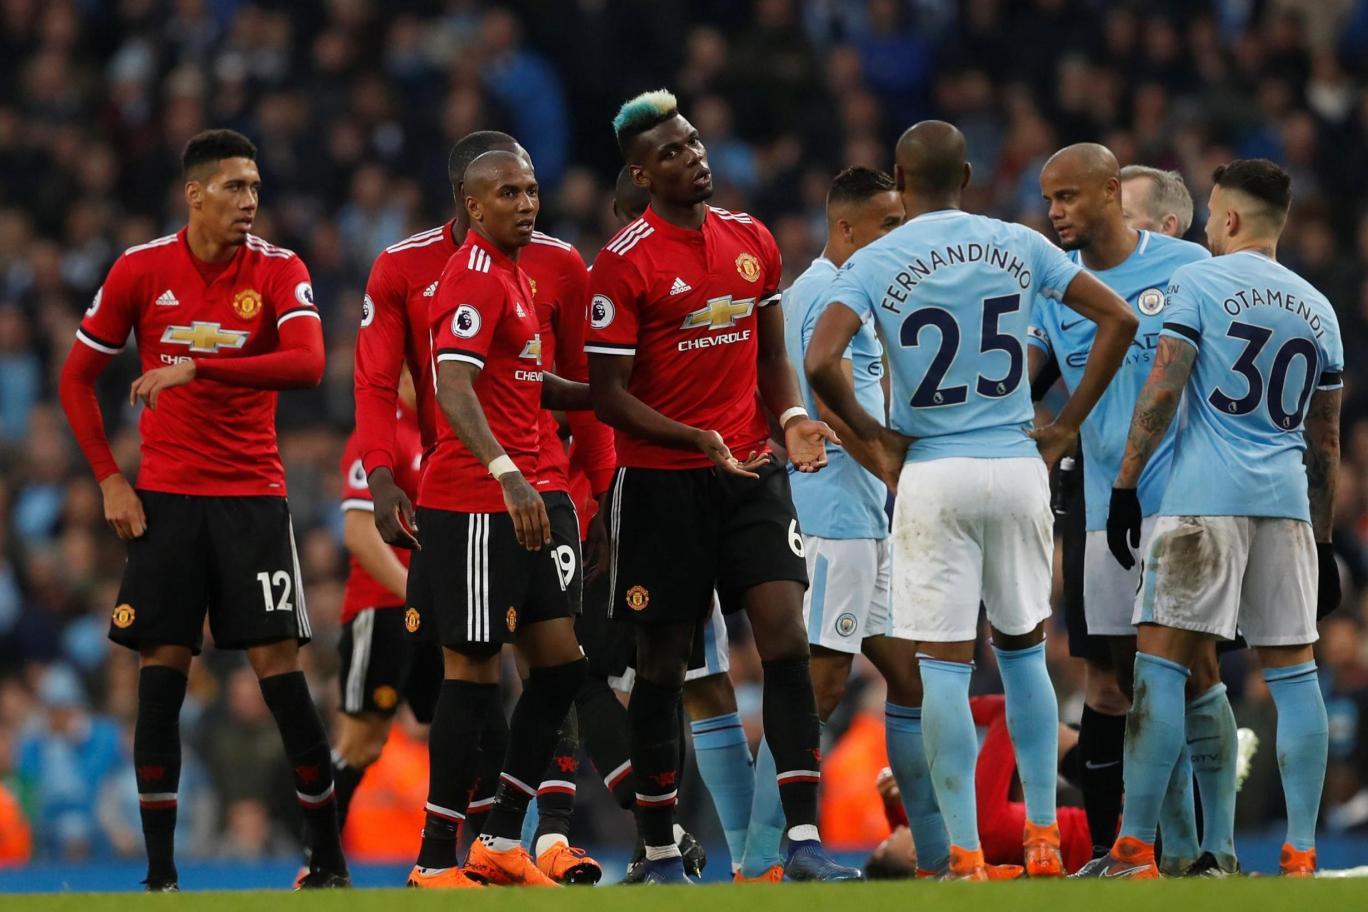 Man City United